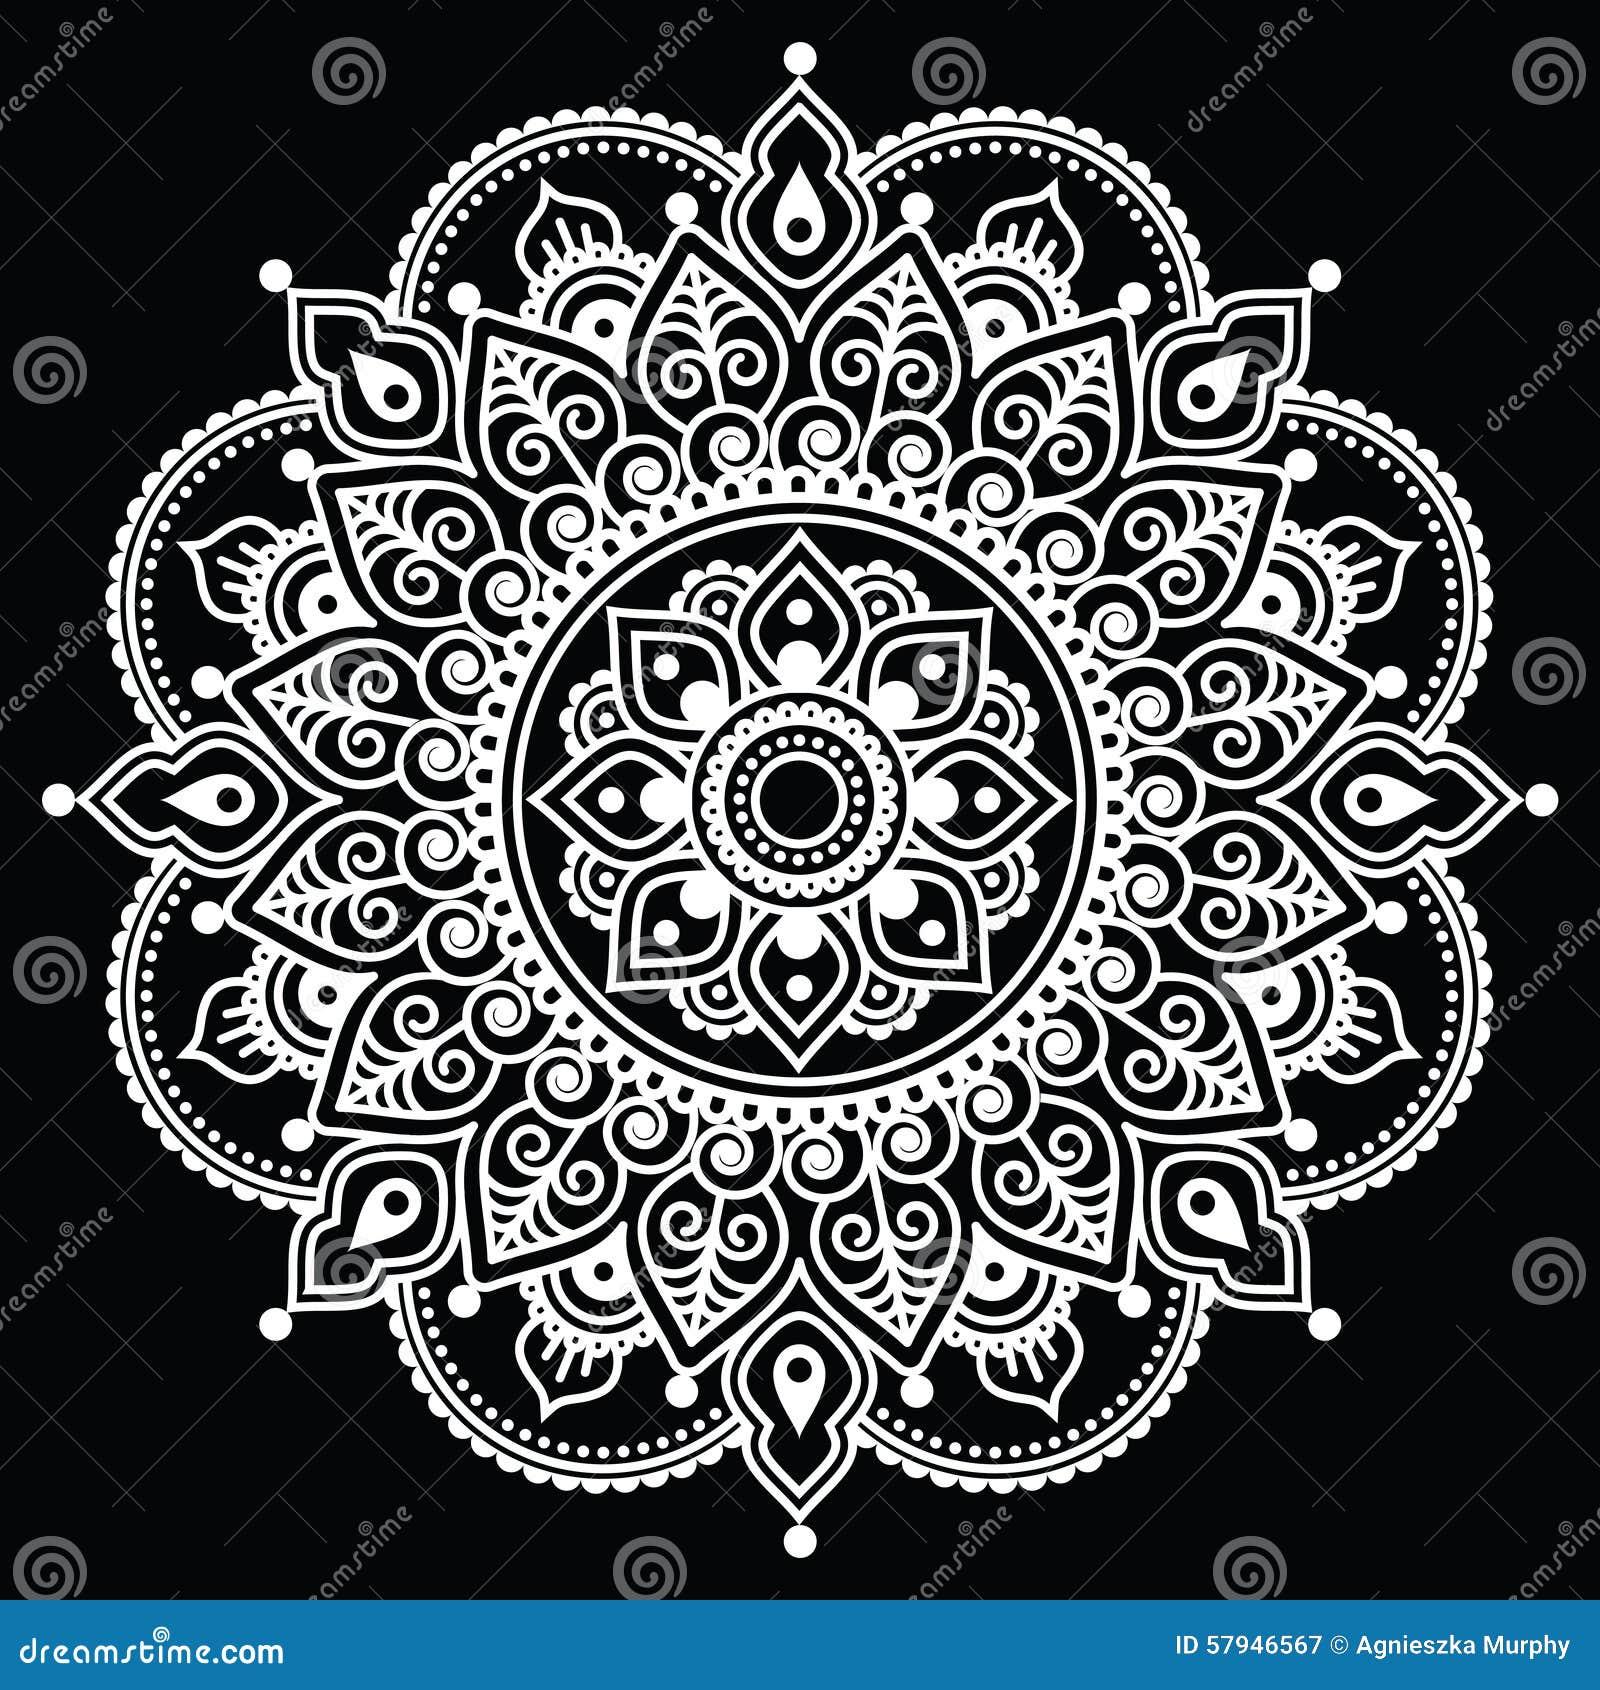 White henna design 5 five white henna designs - Mehndi Indian Henna Tattoo White Pattern On Black Background Stock Illustration